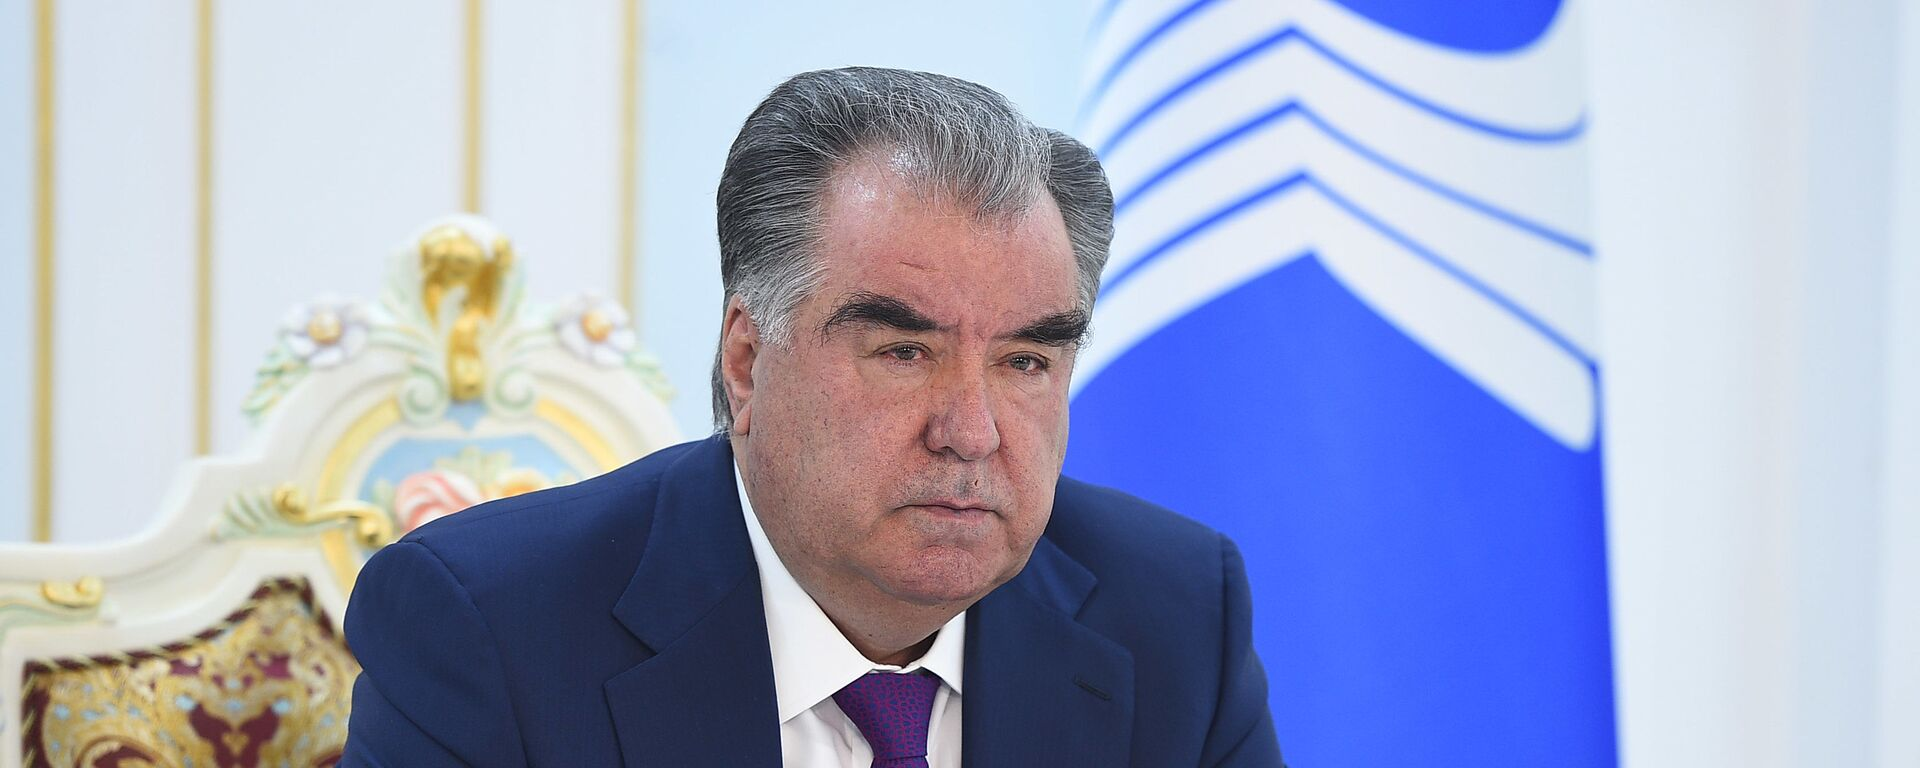 Президент Республики Таджикистан Эмомали Рахмон - Sputnik Тоҷикистон, 1920, 03.03.2021